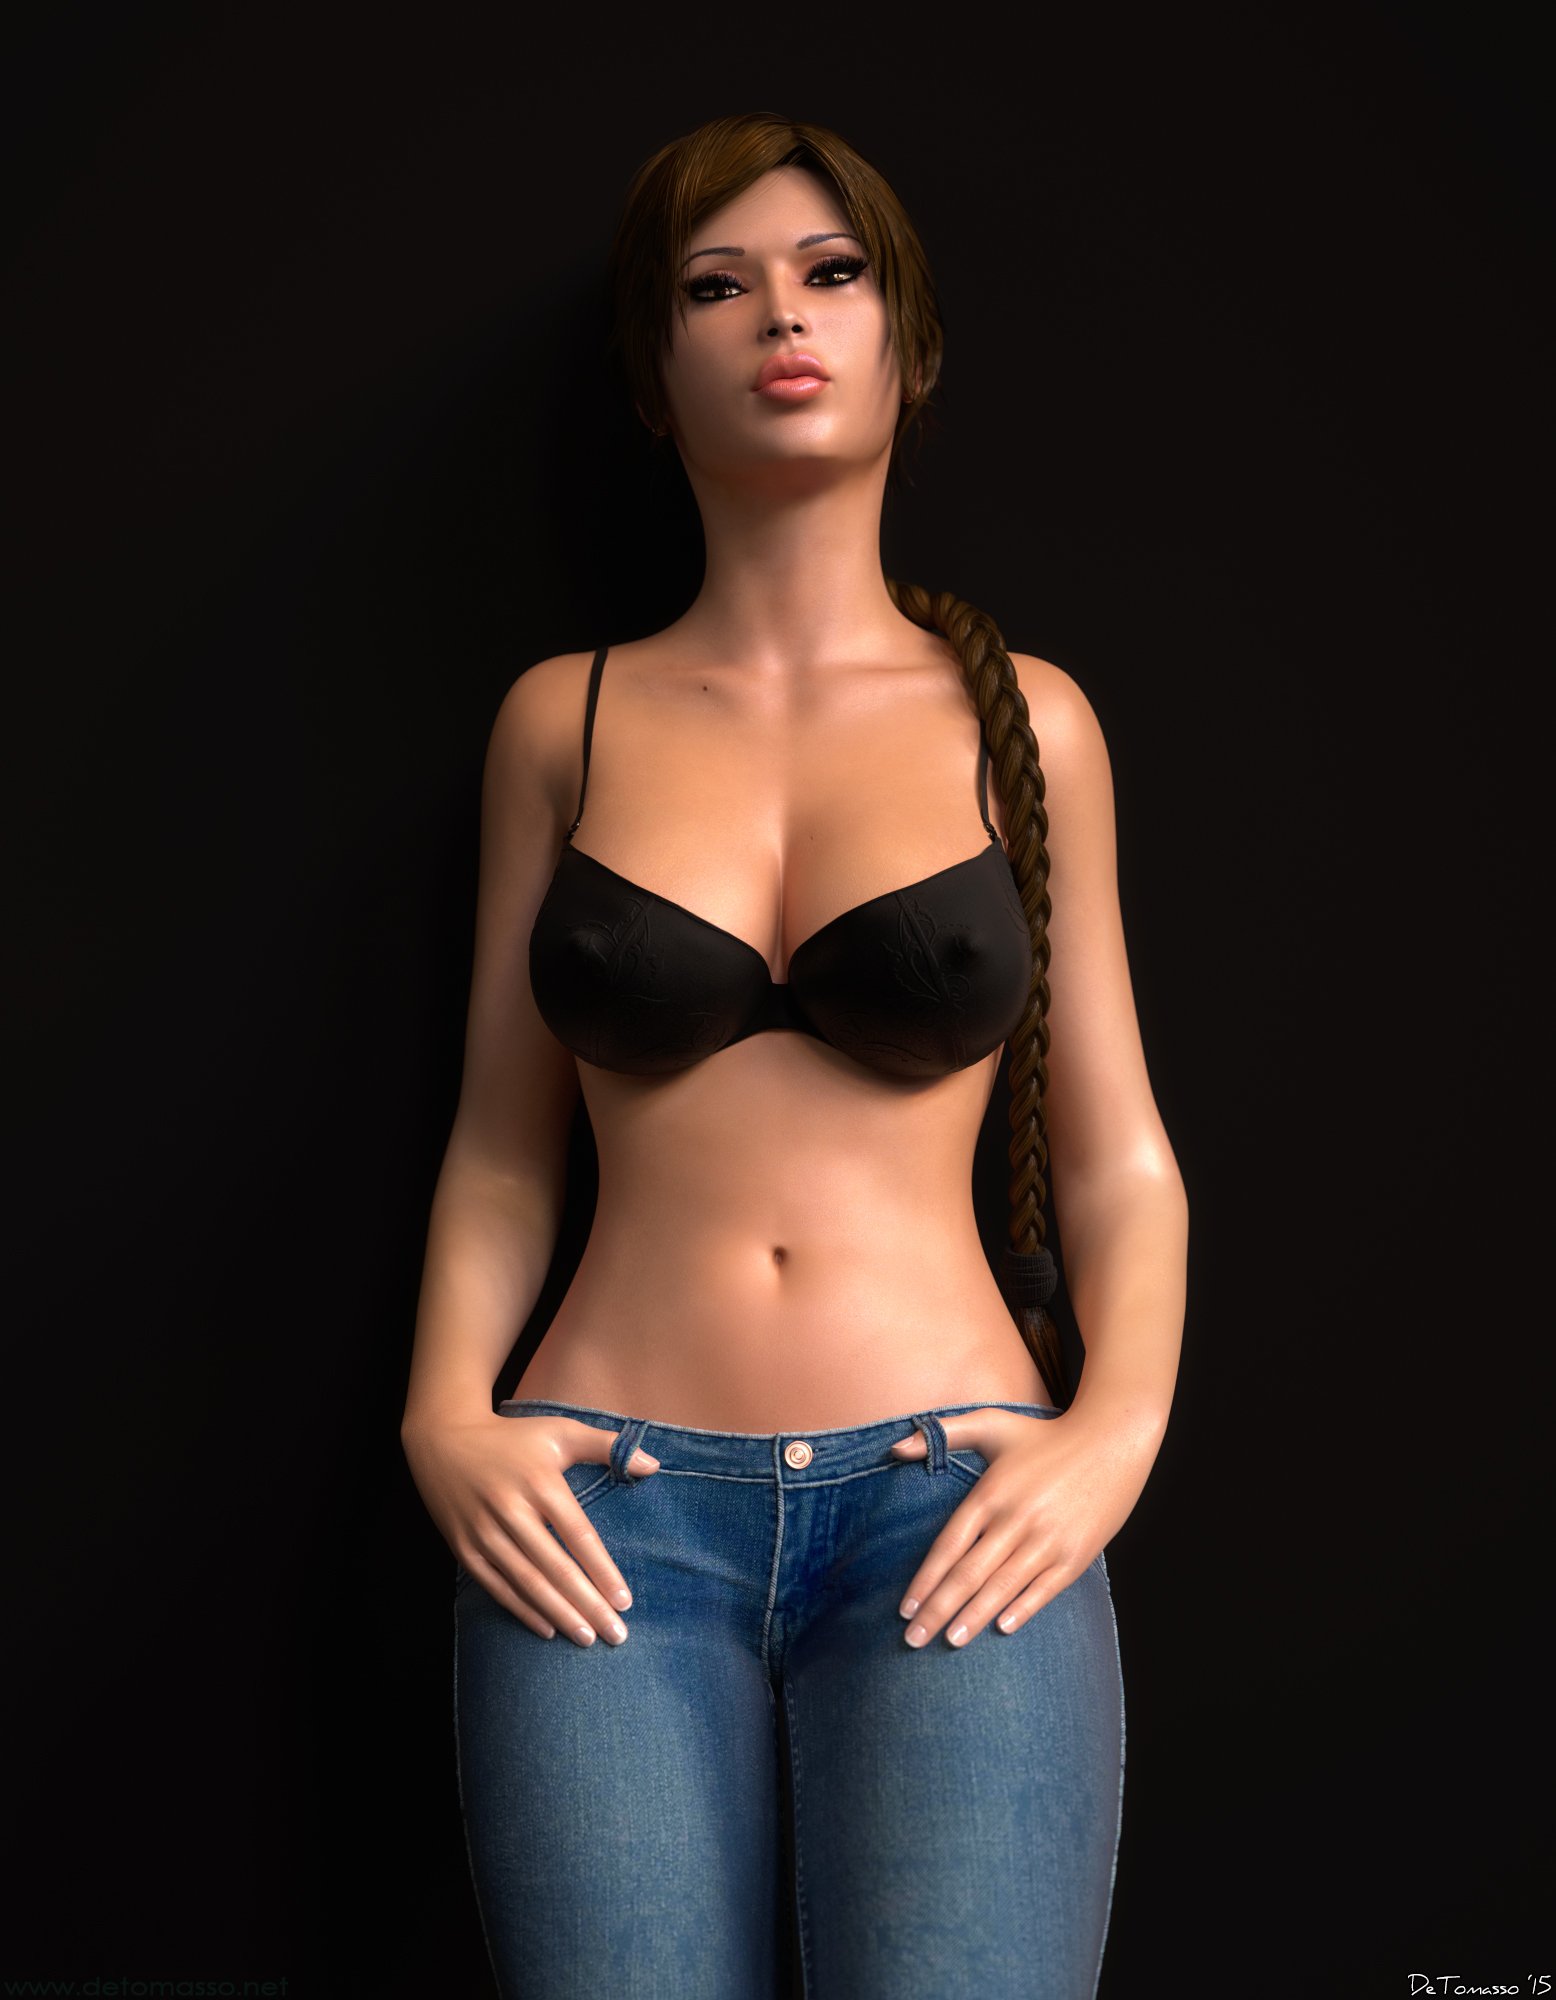 3d lara croft lingerie pornos images